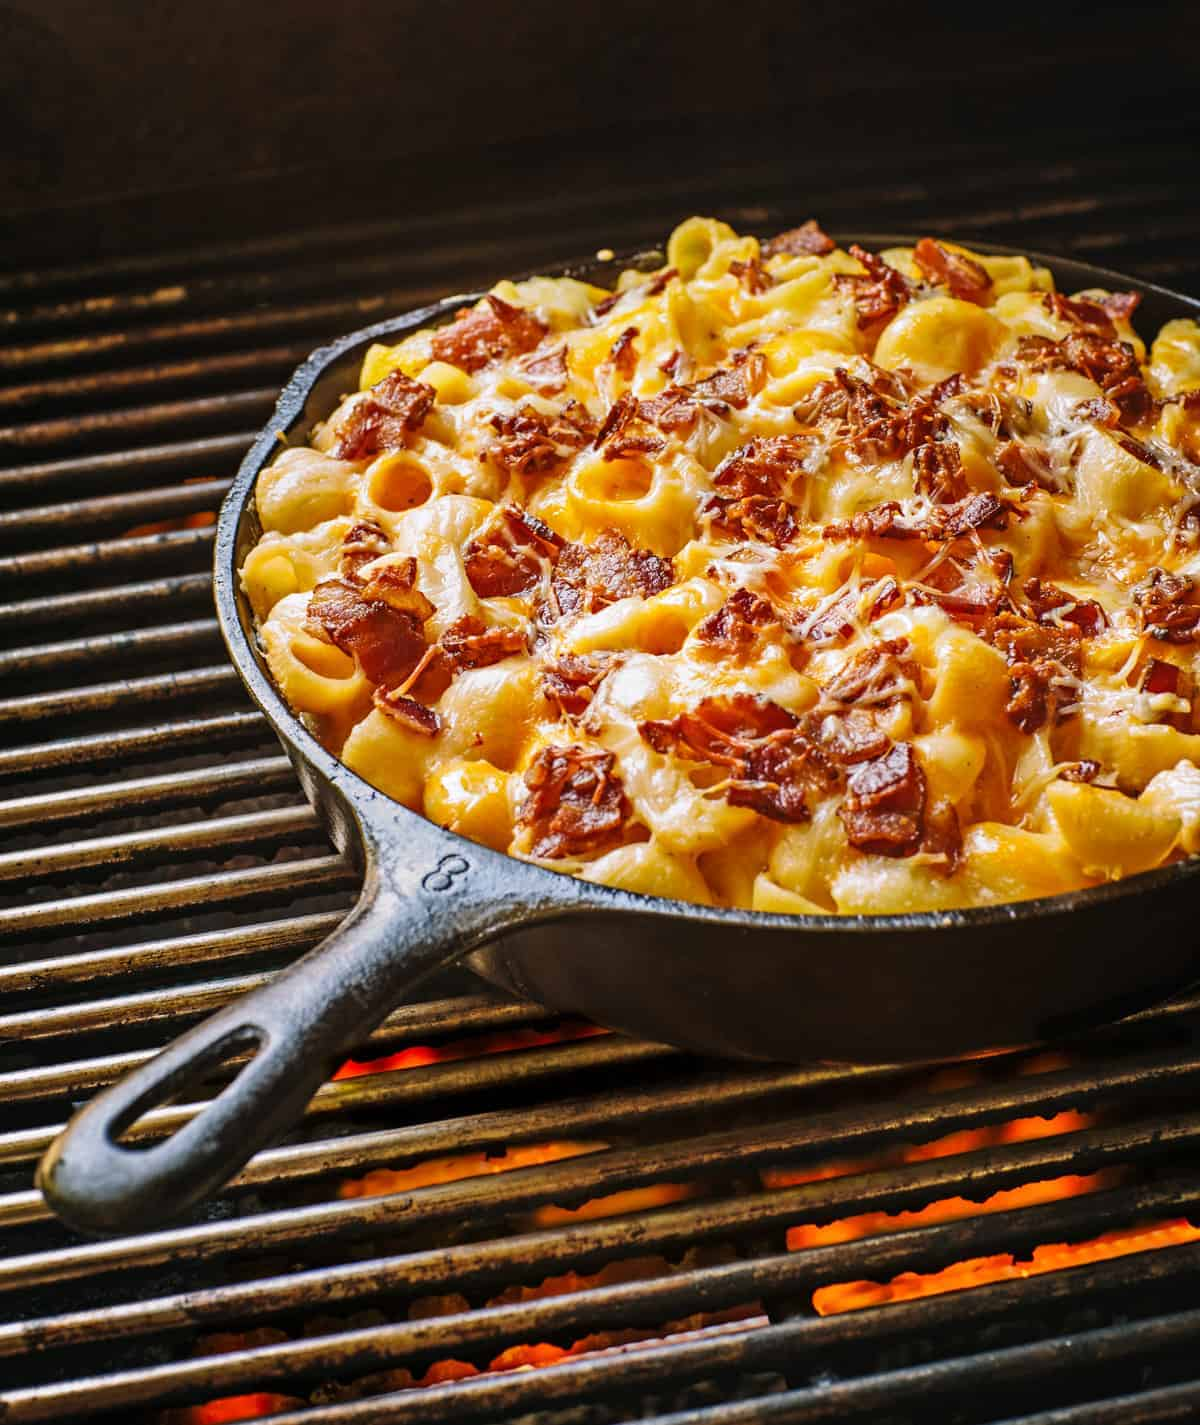 Smoked Mac 'N' Cheese